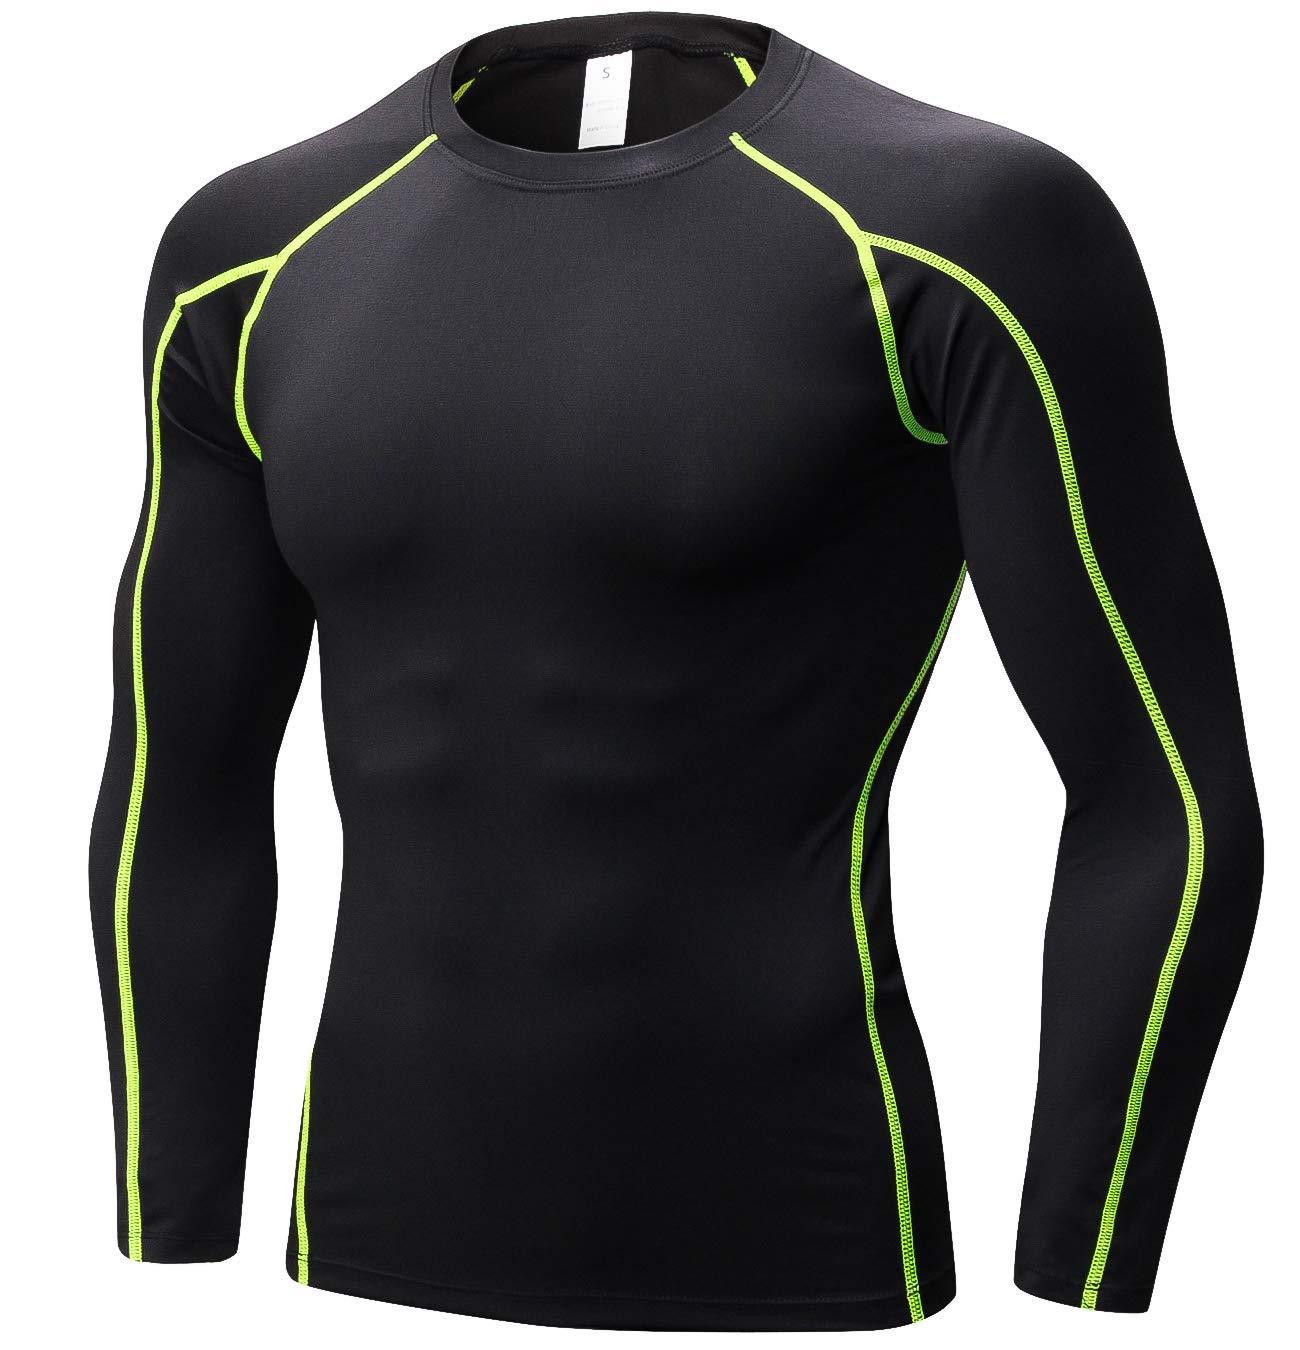 SILKWORLD Men's Long-Sleeve Compression Shirt Base-Layer Running Top,Black(Green Stripe), S by SILKWORLD (Image #1)